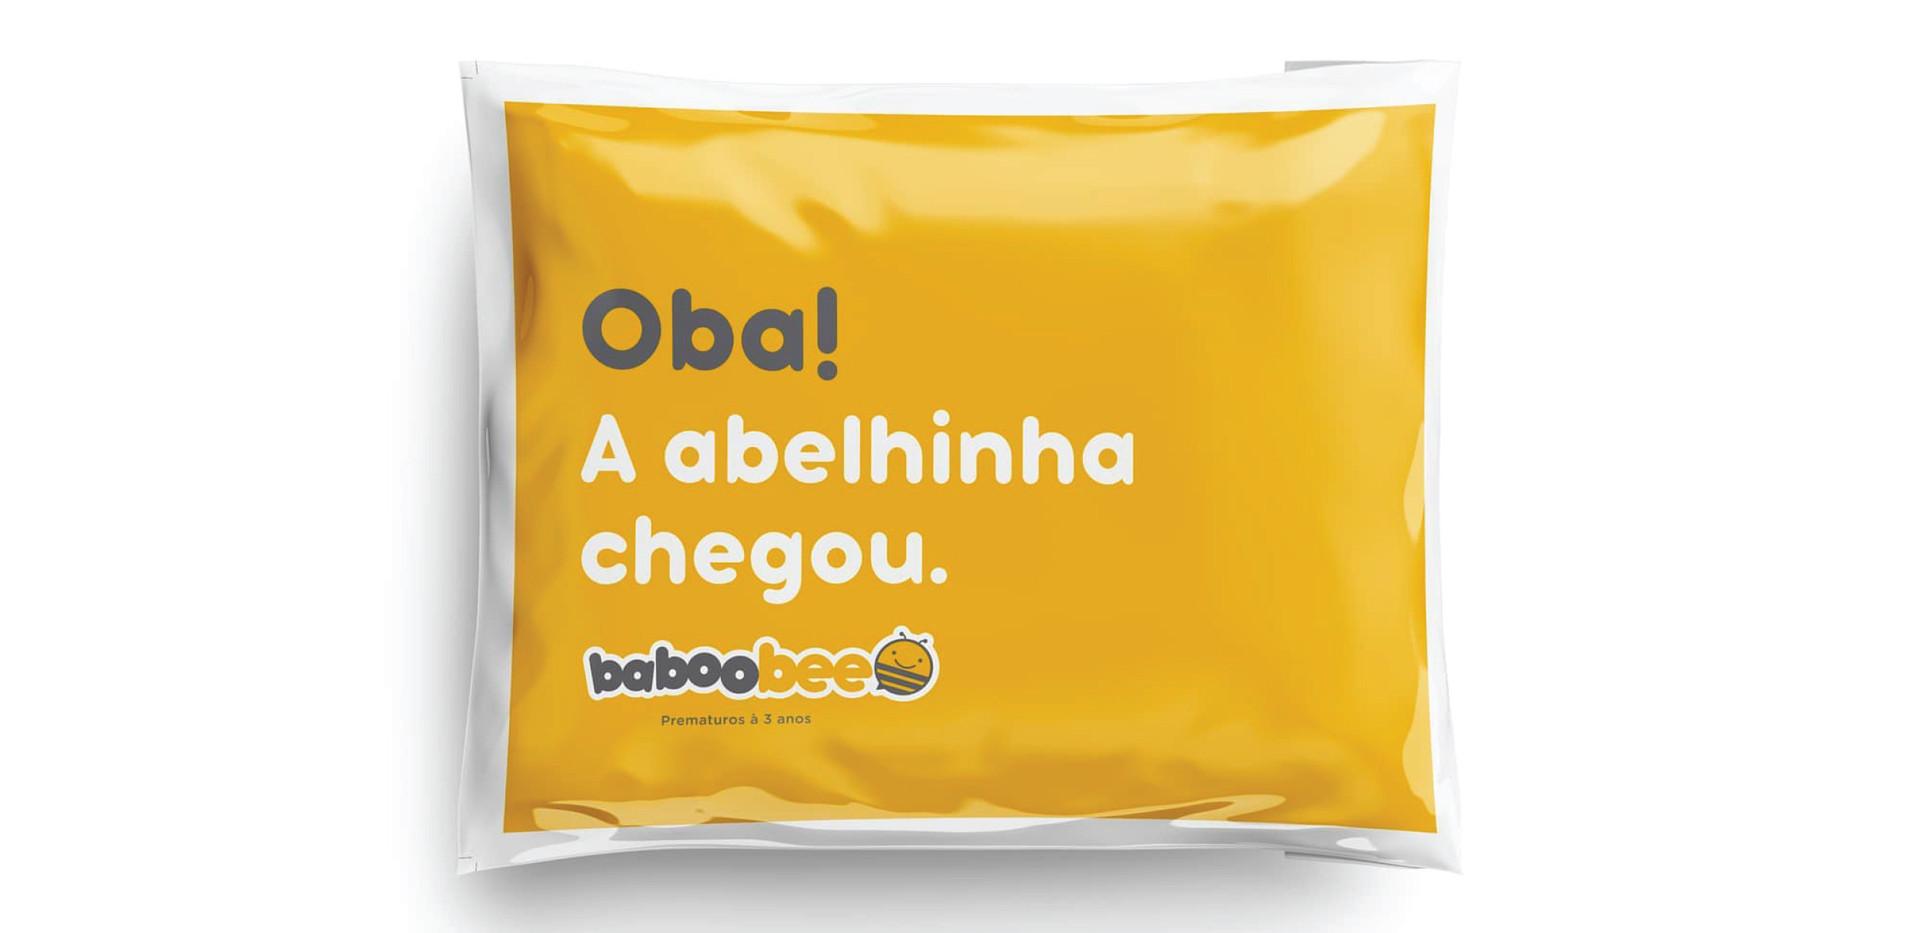 Embalagem Baboobee